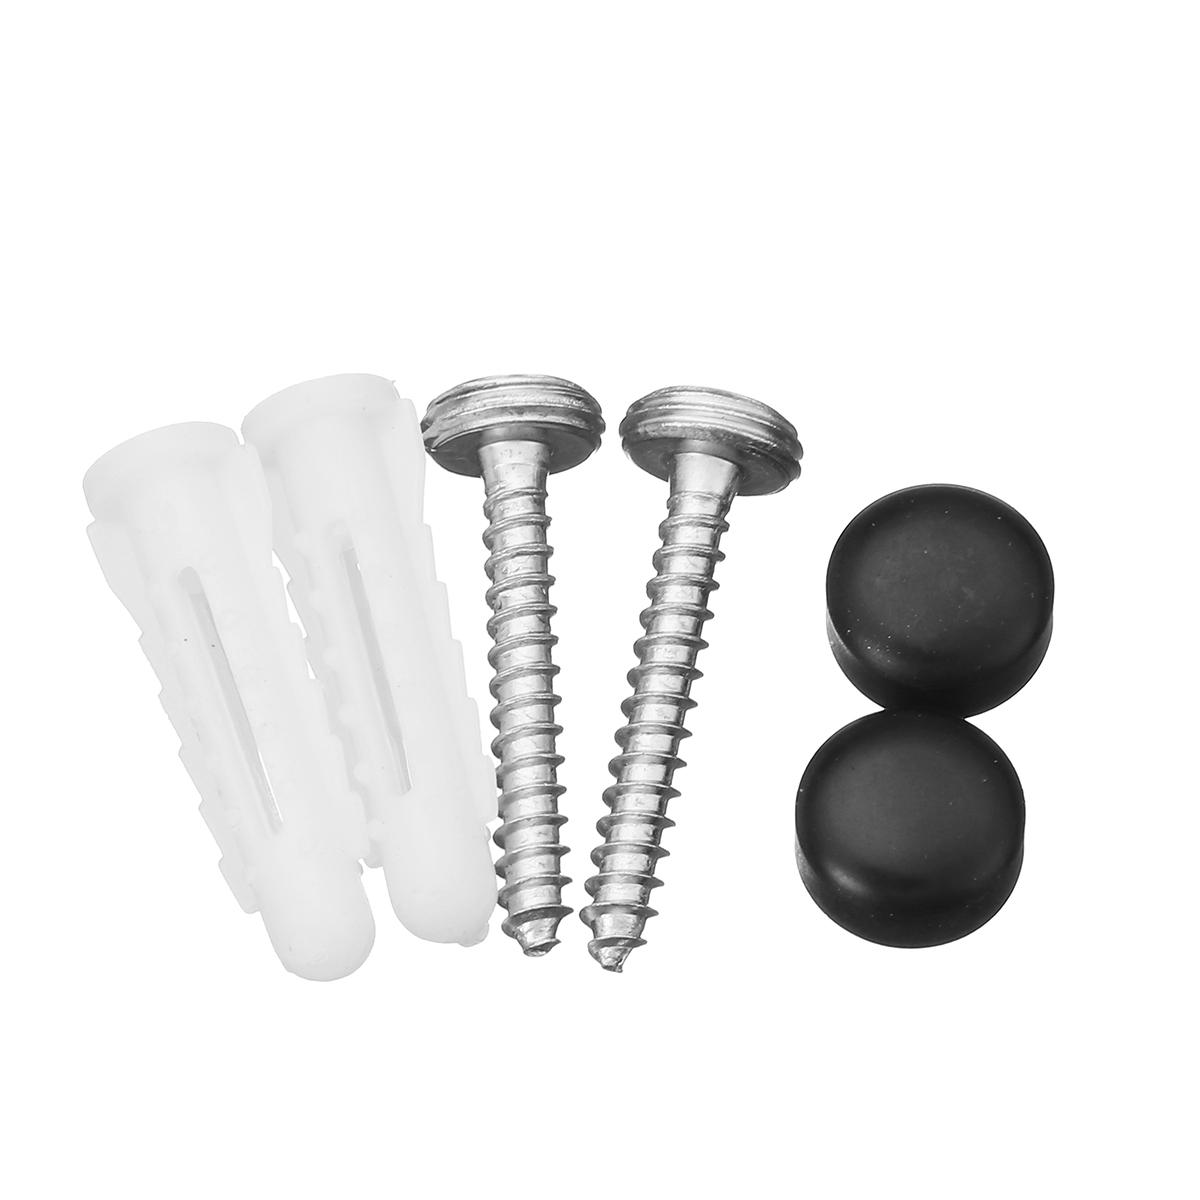 Stainless Steel Shower Caddy Storage Kitchen Rack Holder Wall Mount Rectangle Bathroom Drain Shelf